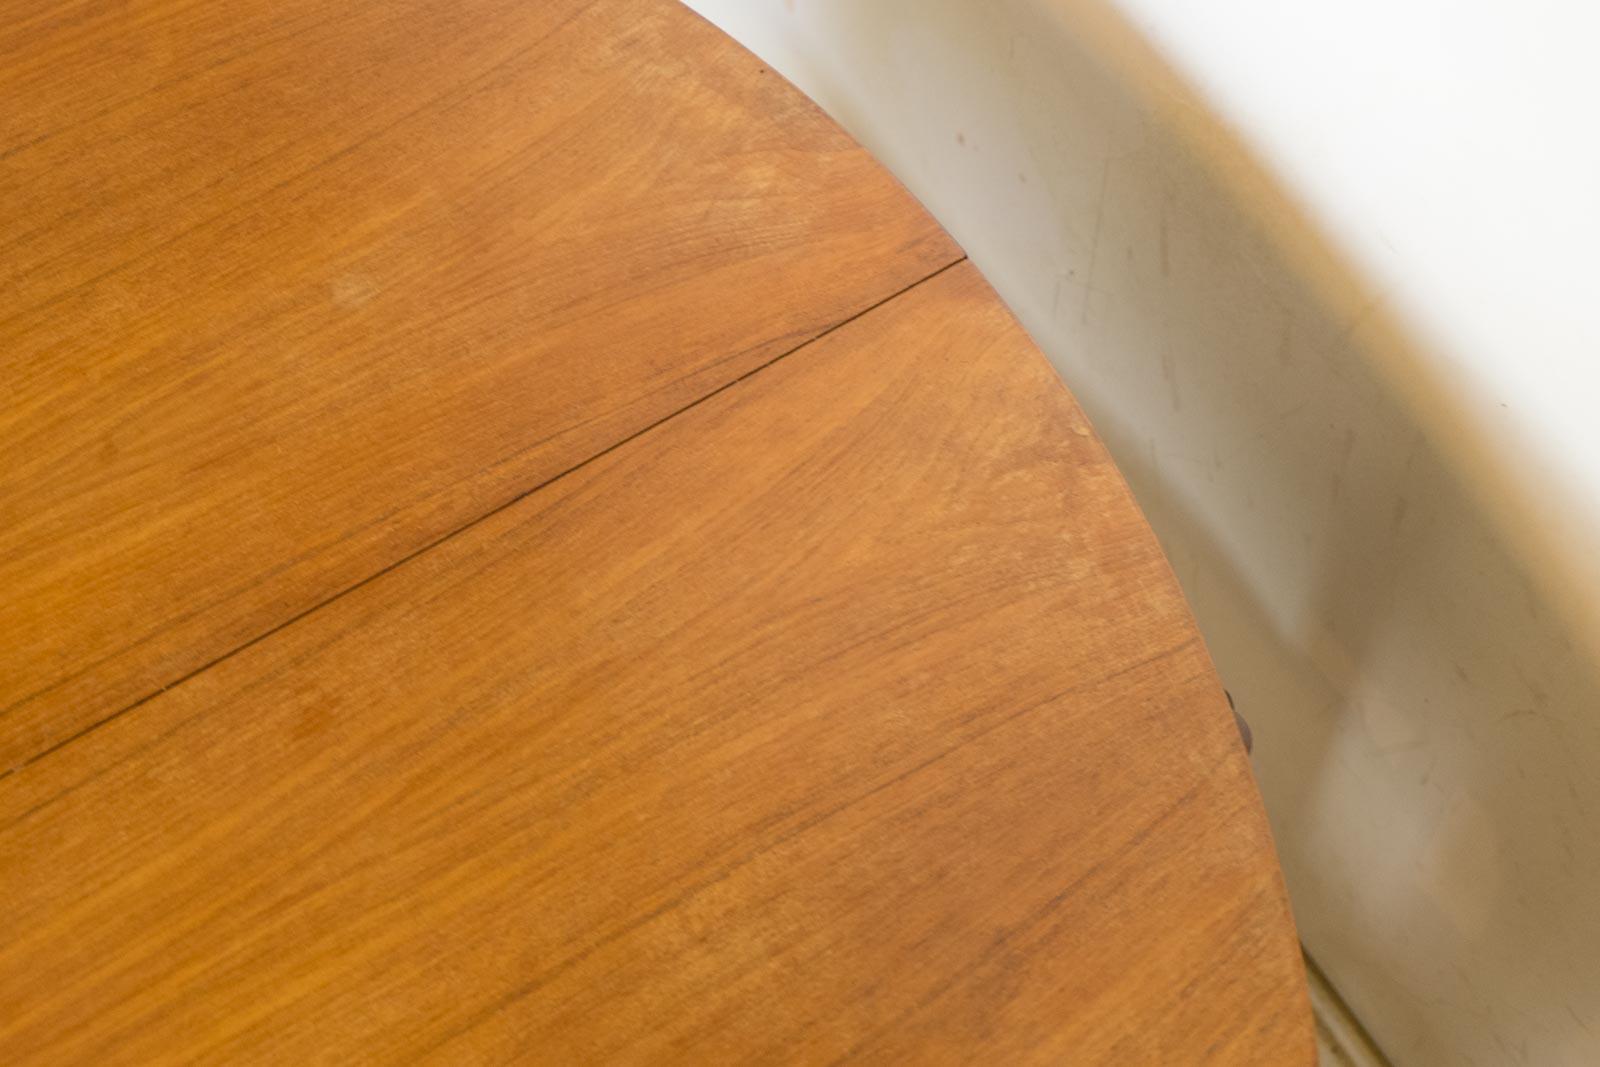 VINTAGE RETRO MID CENTURY TEAK DINING TABLE amp FOUR 4 TUCK  : HV150109 5 from www.ebay.co.uk size 1600 x 1067 jpeg 141kB